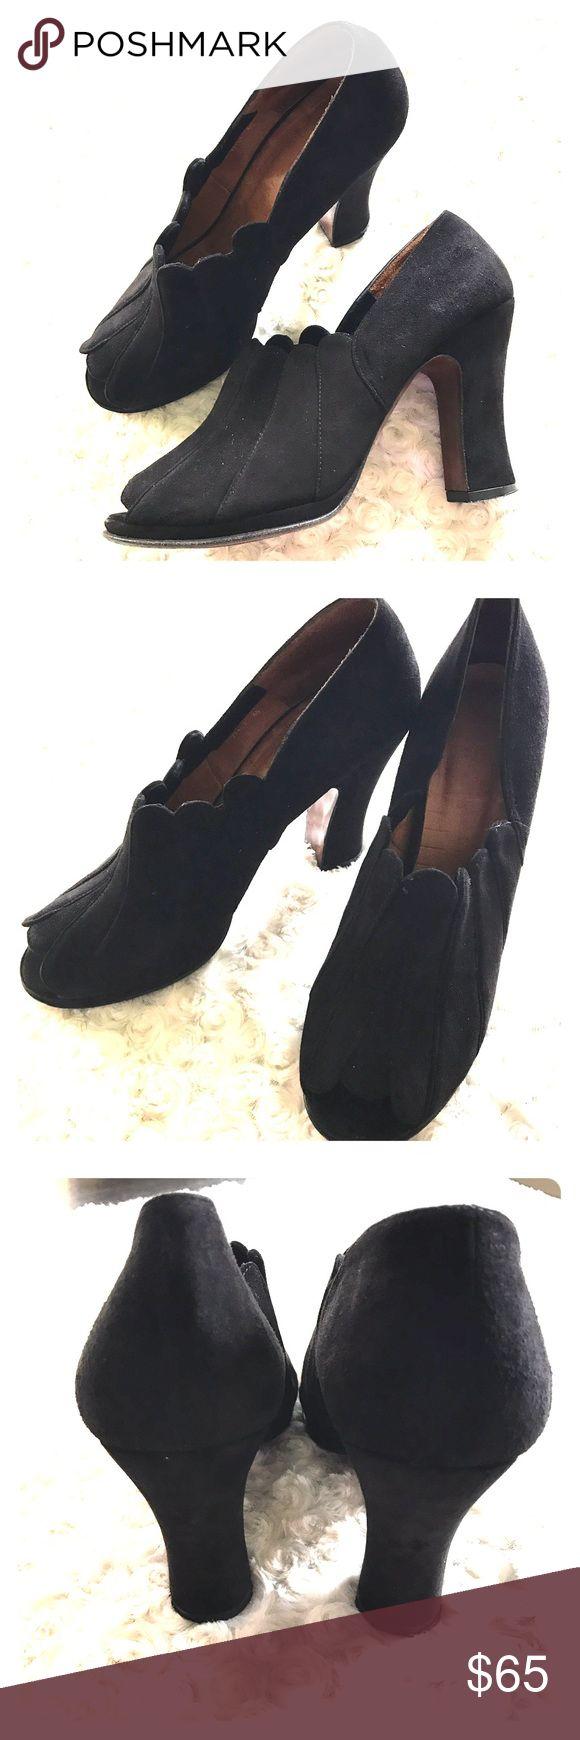 ‼️super sale‼️Chie Mihara EUC. Chie Mihara Shoes